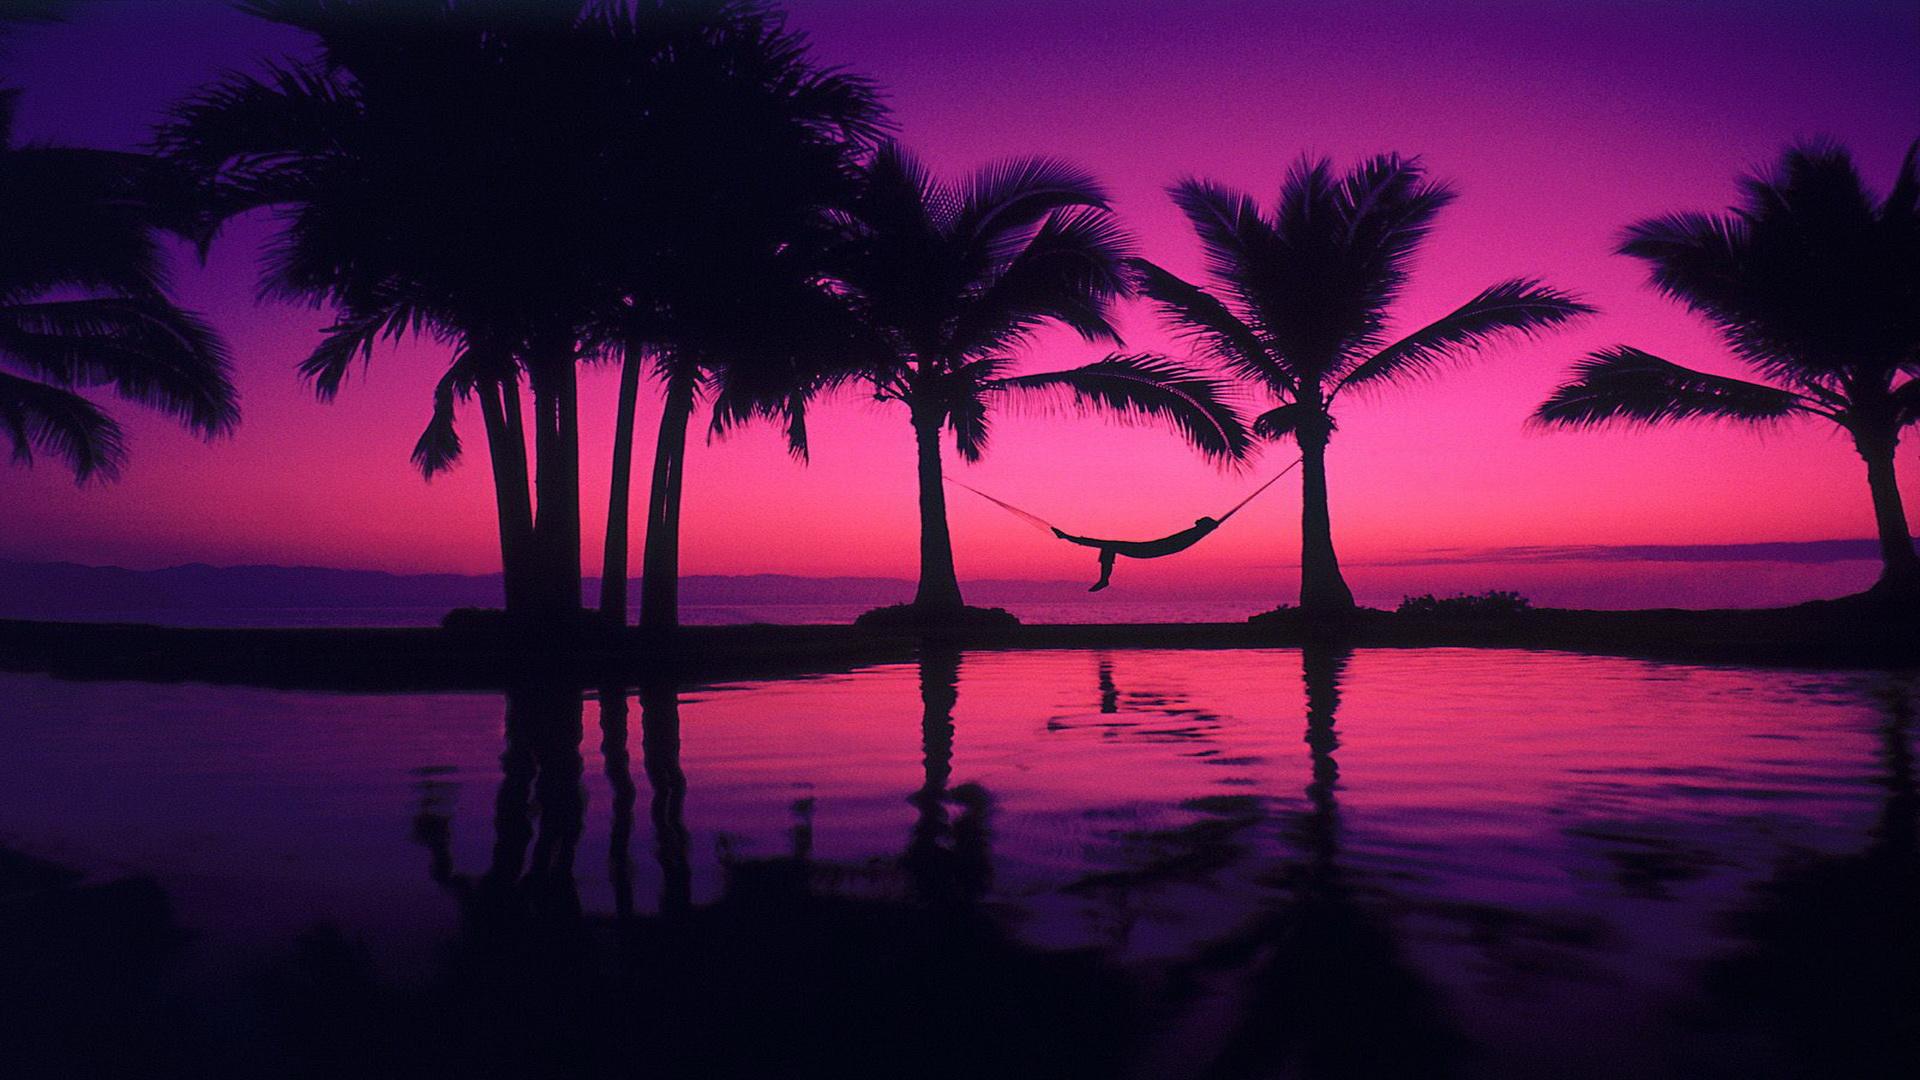 Wallpaper Hd De Cancun: Mexico HD Wallpapers